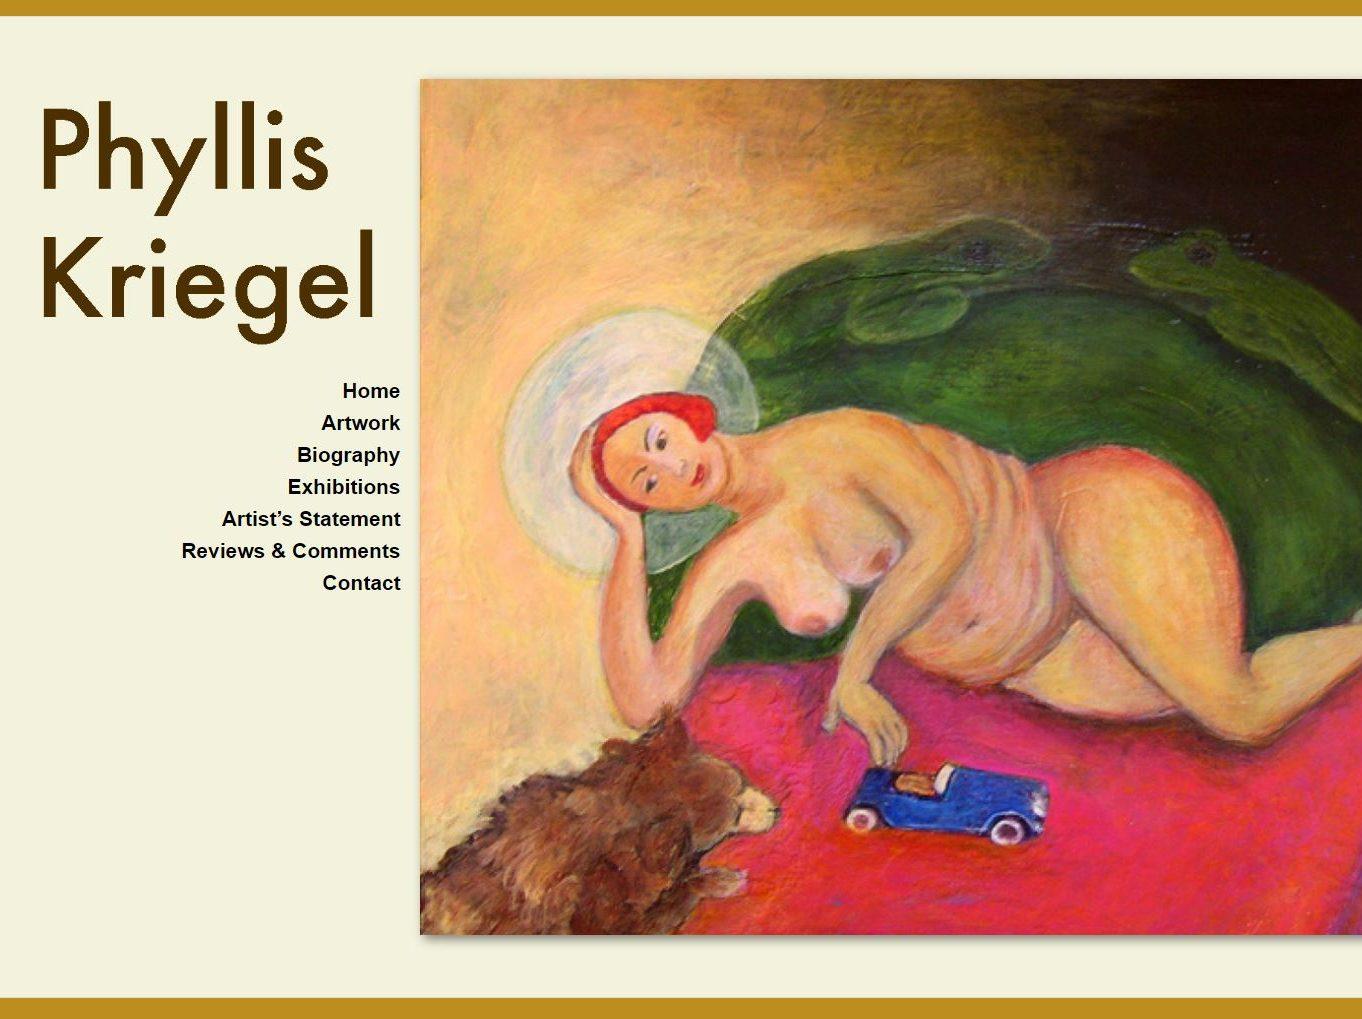 Phyllis Kriegel